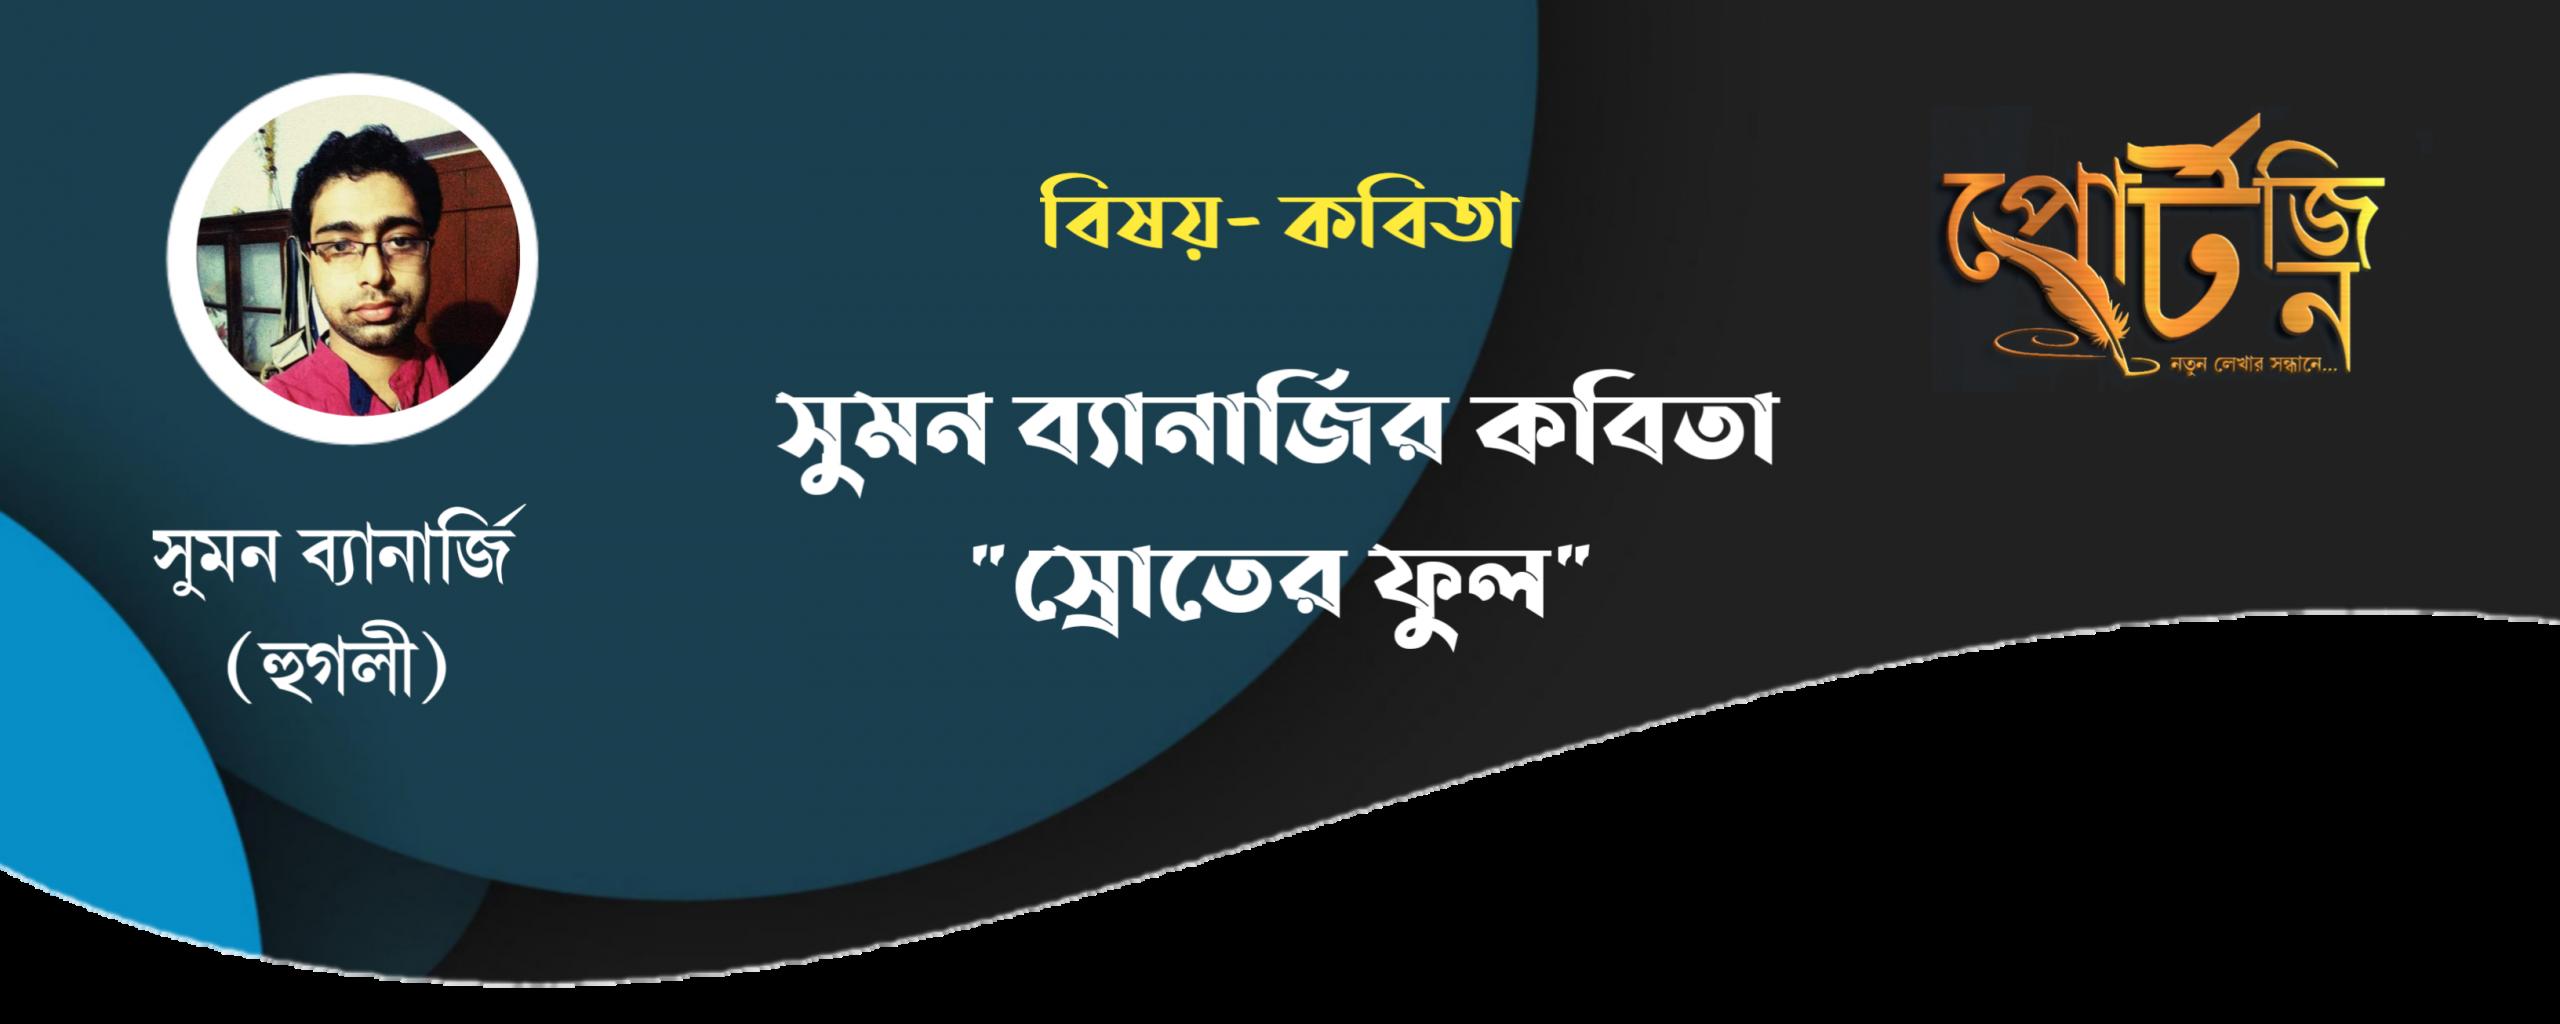 bengali poem portzine suman banerjee